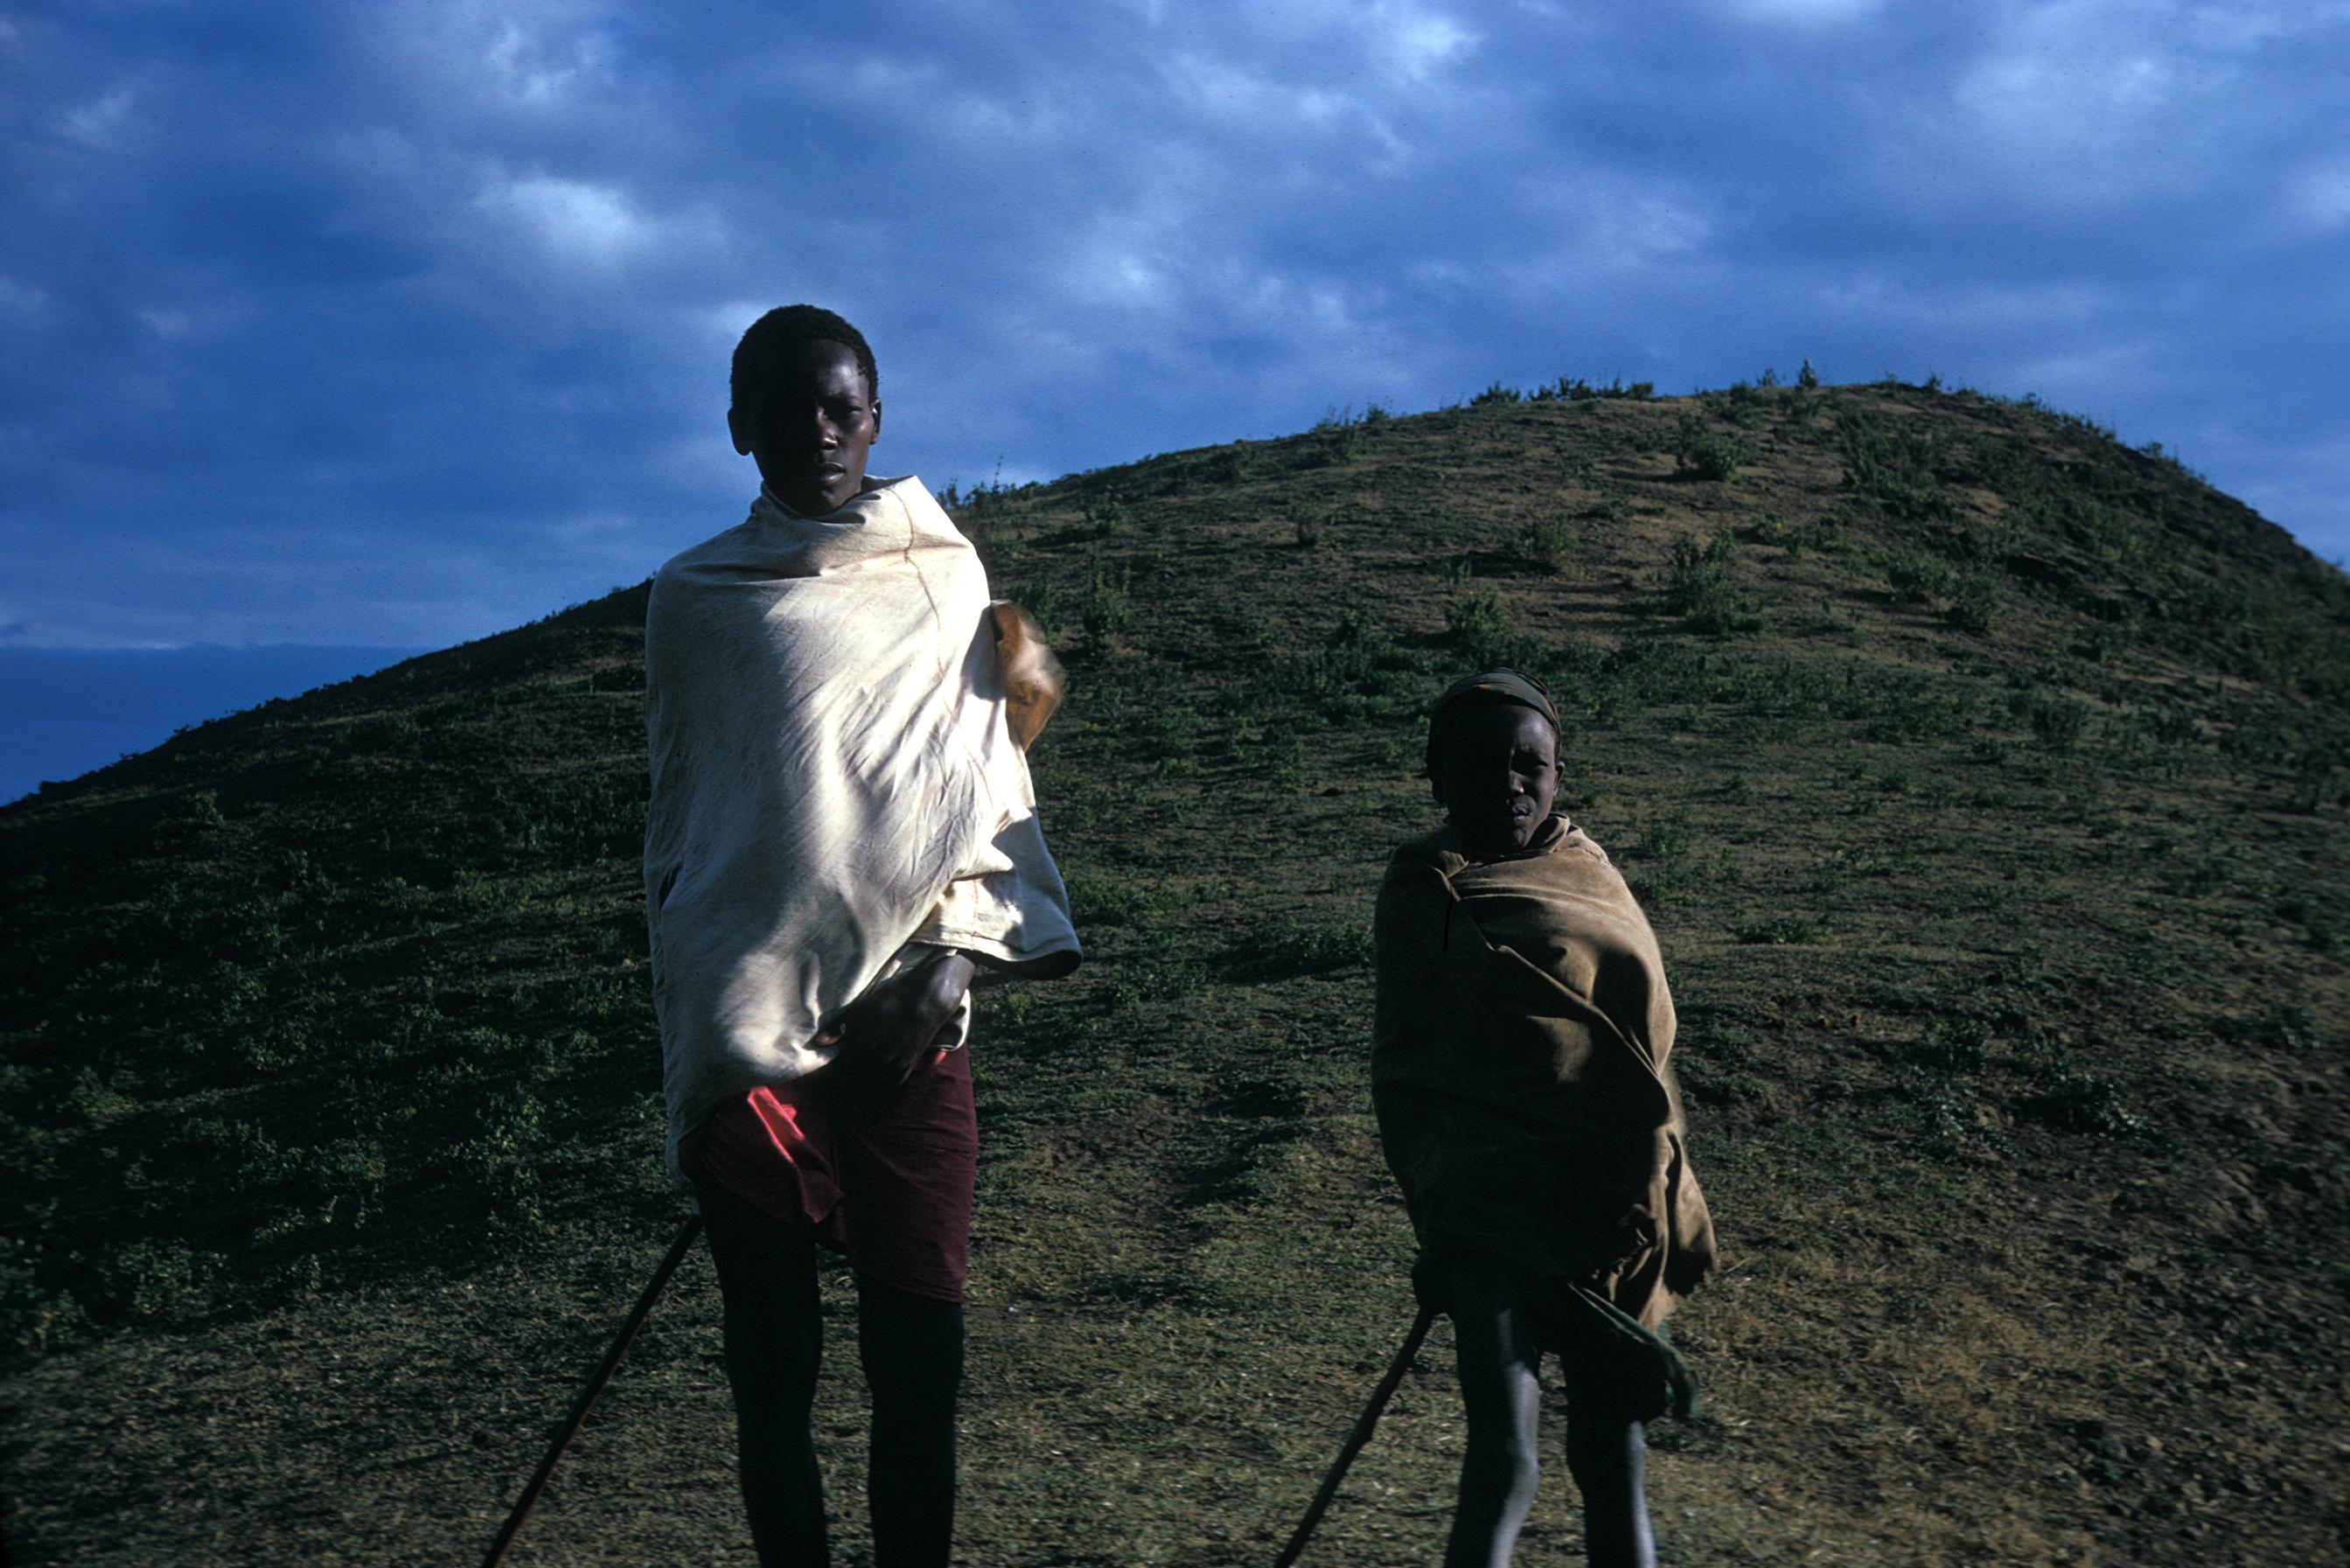 http://jrandomimage.com/images/tanzania-masai-boys-1974.jpg